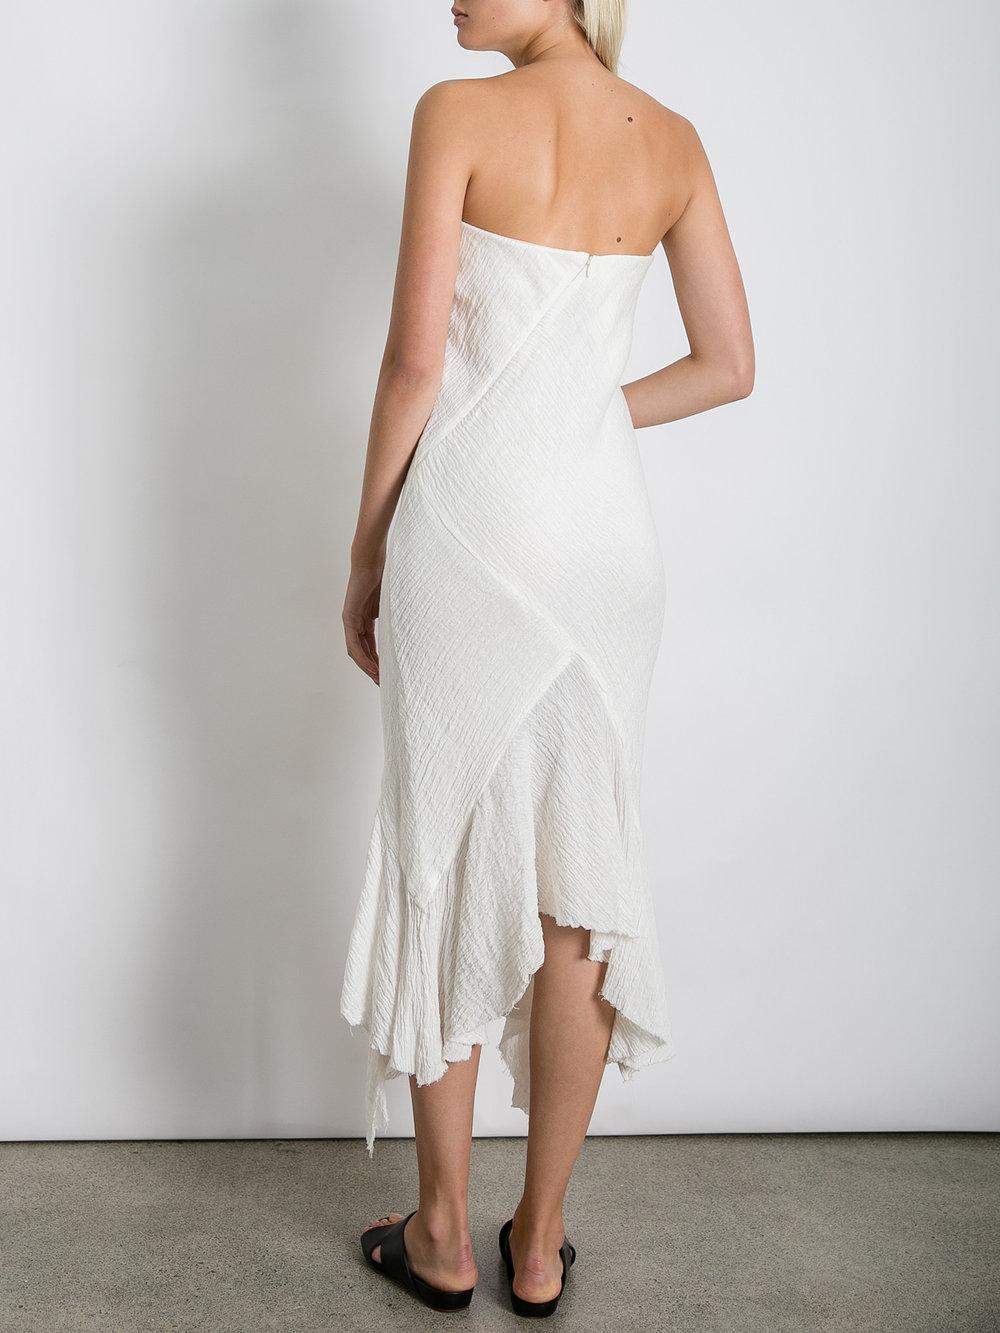 THE_UNDONE_KITX_Crush_Linen_Strapless_Dress_White_FB.jpg